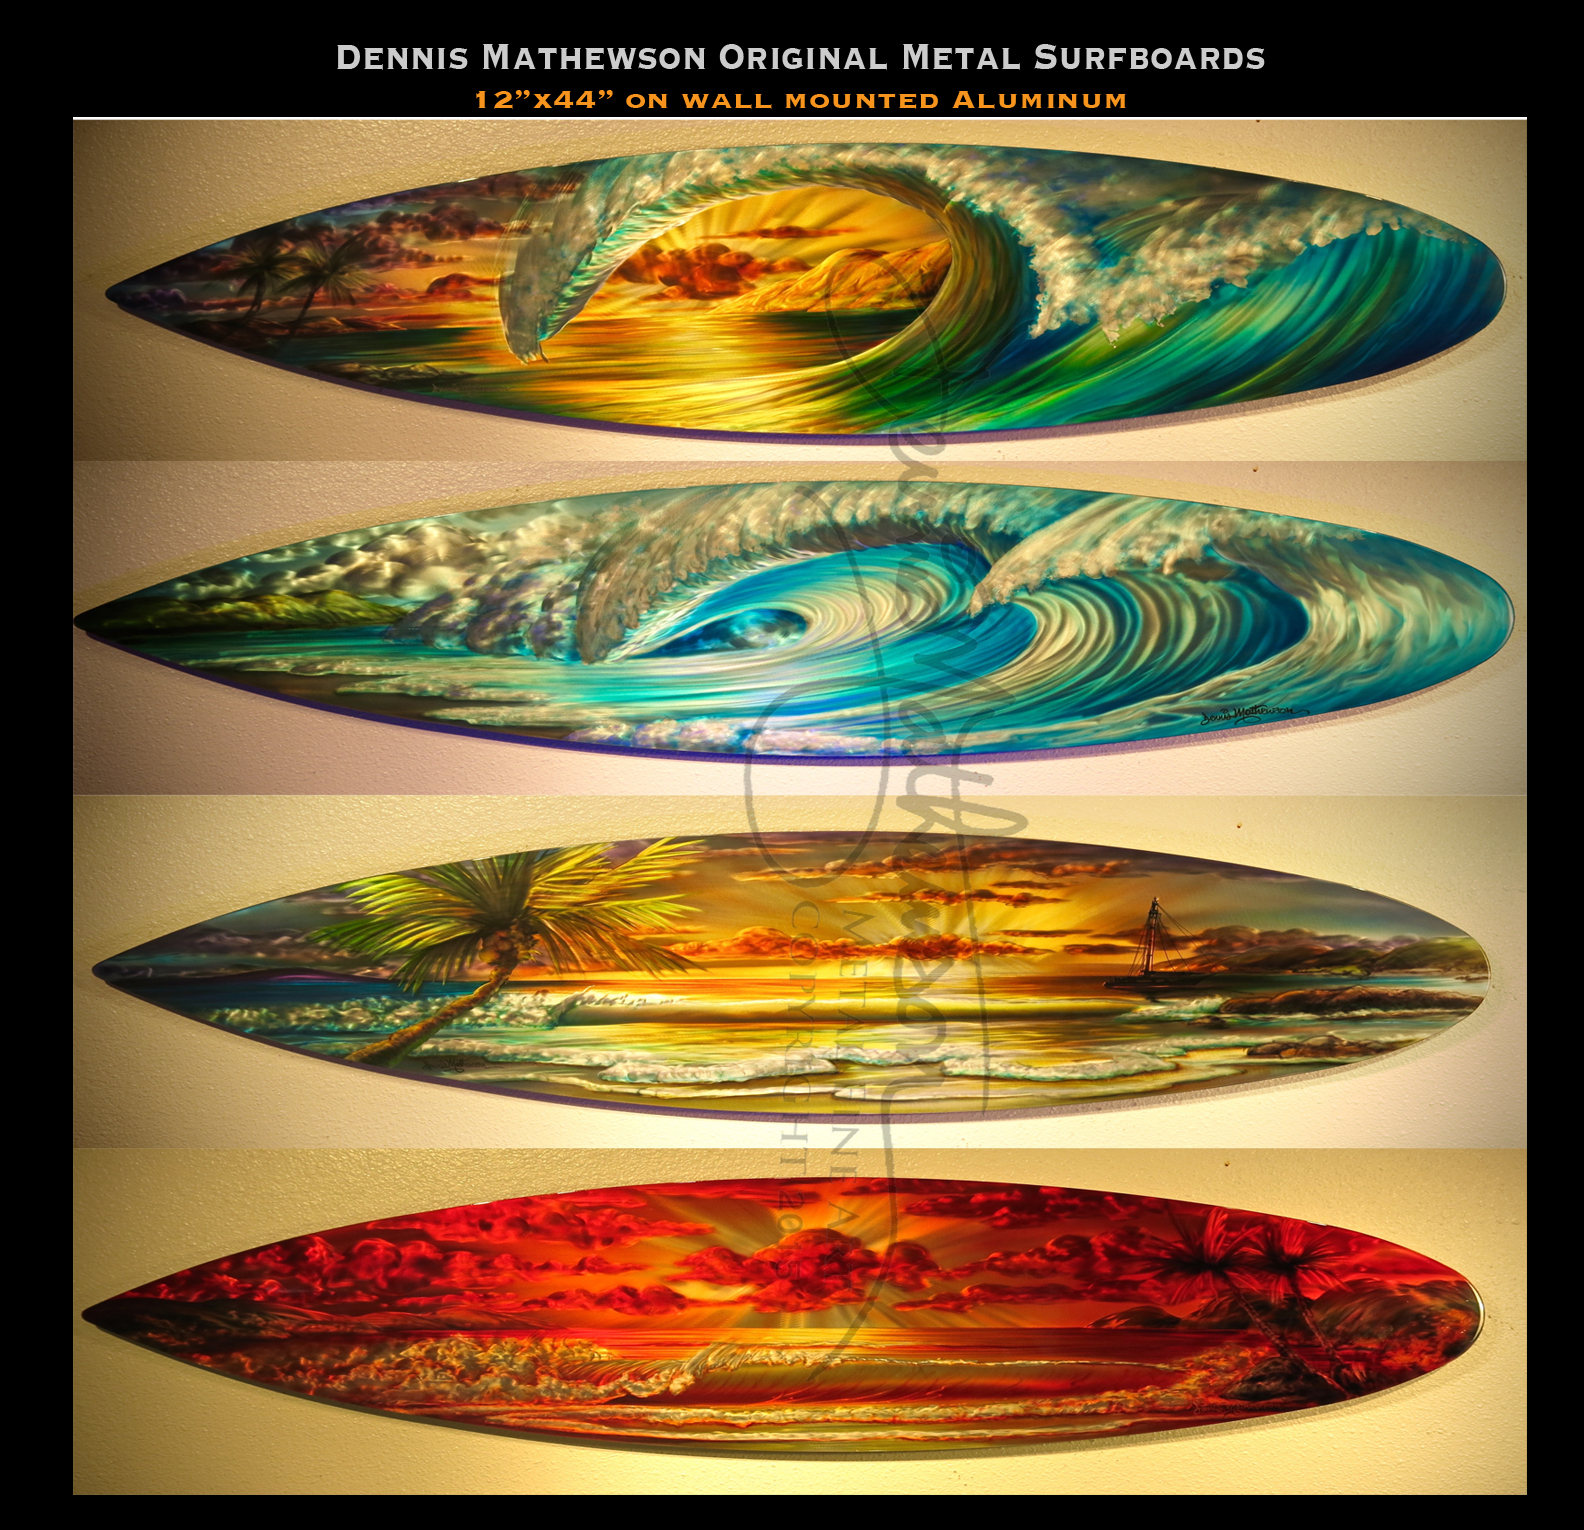 Dennis Mathewson Art and Events Blog